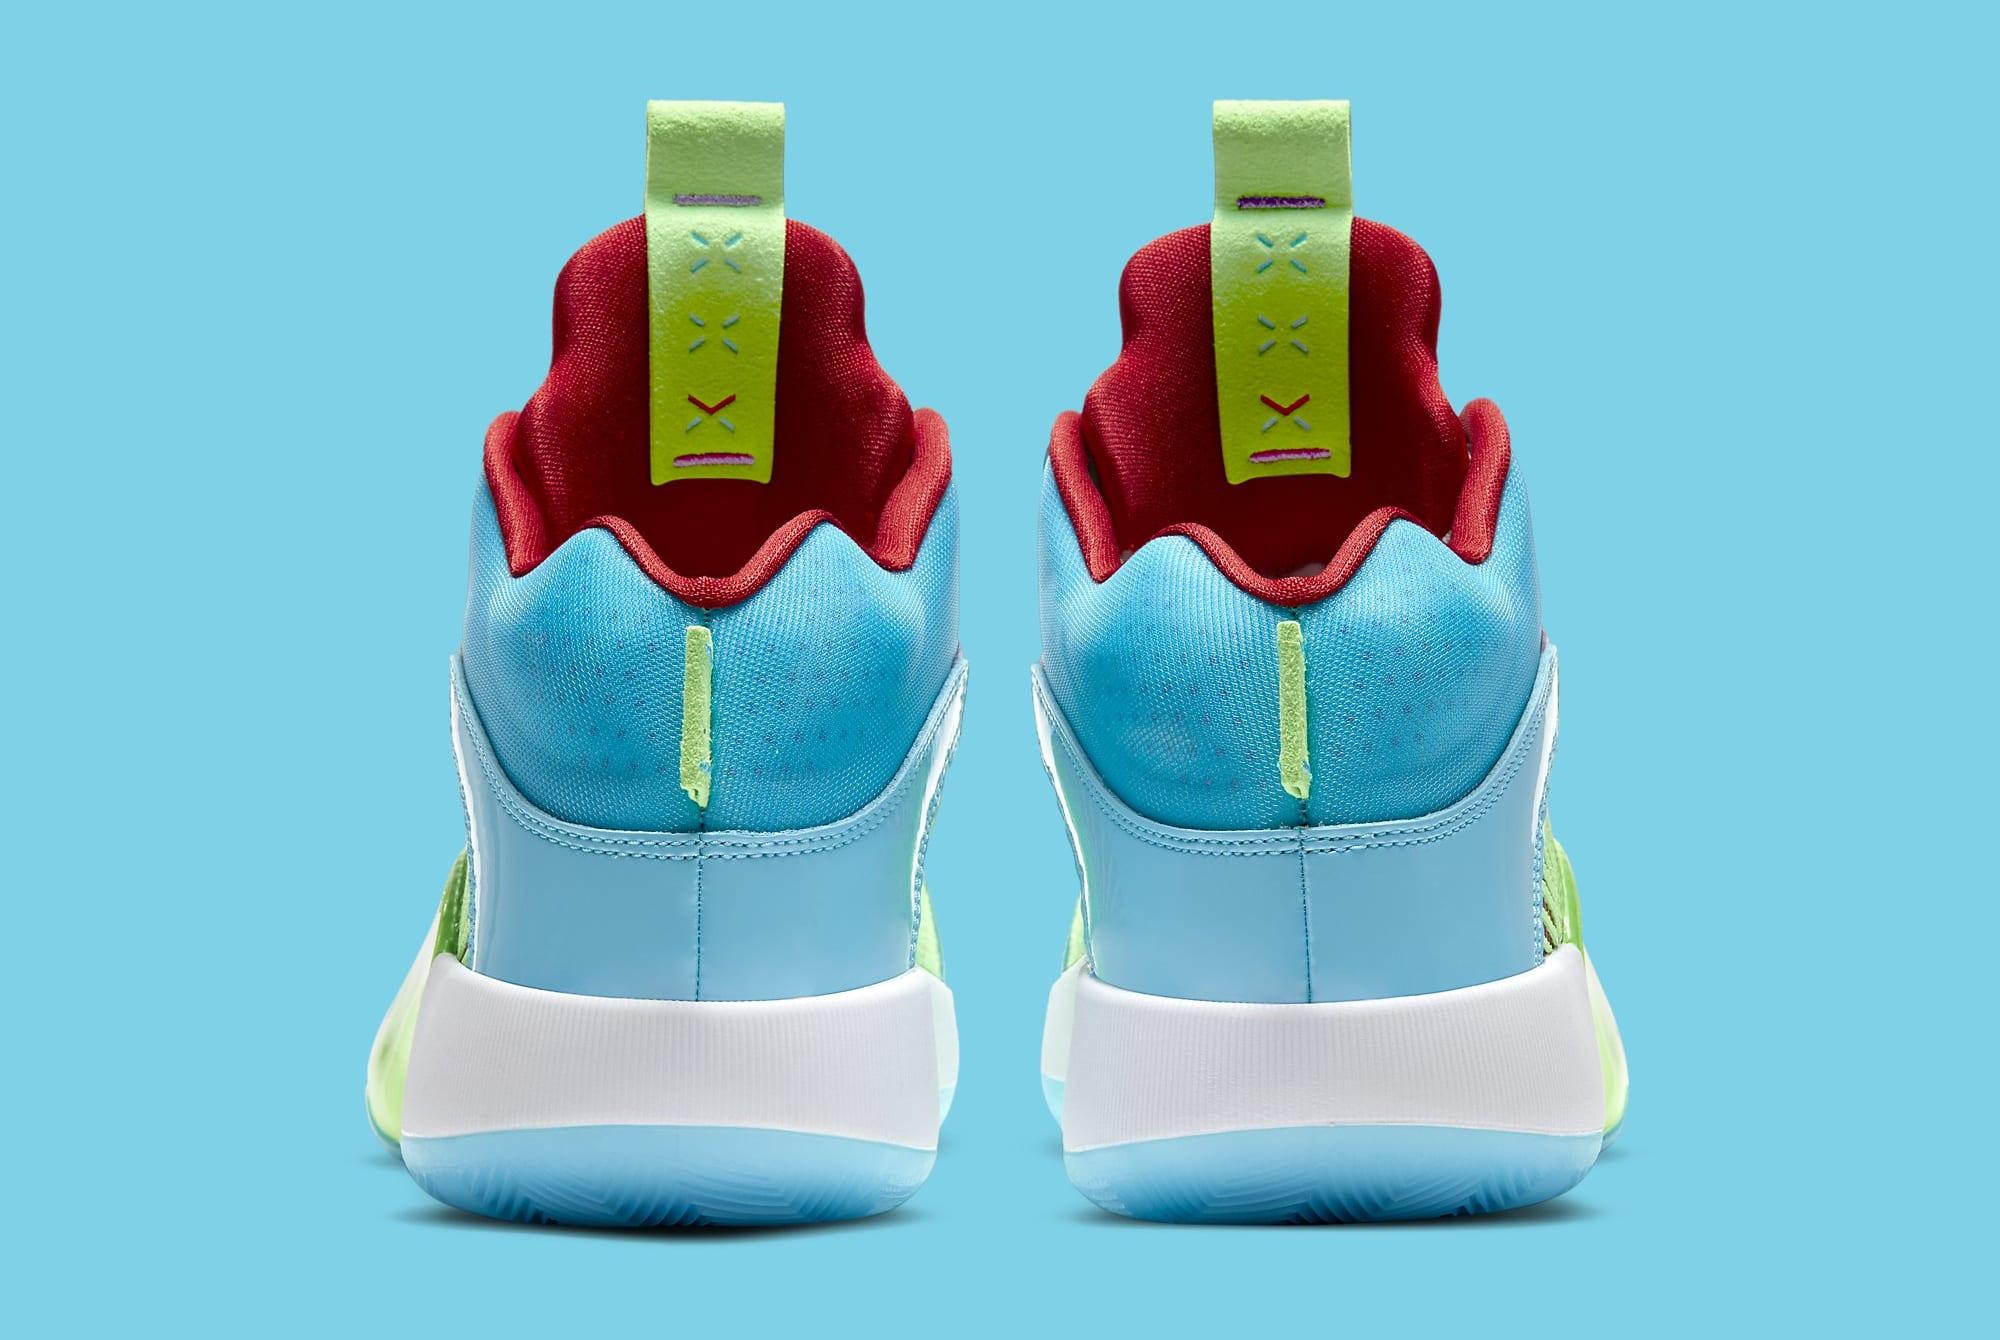 Jayson Tatum Air Jordan 35 PE 'Greatest Gift' DD3669-400 Heel